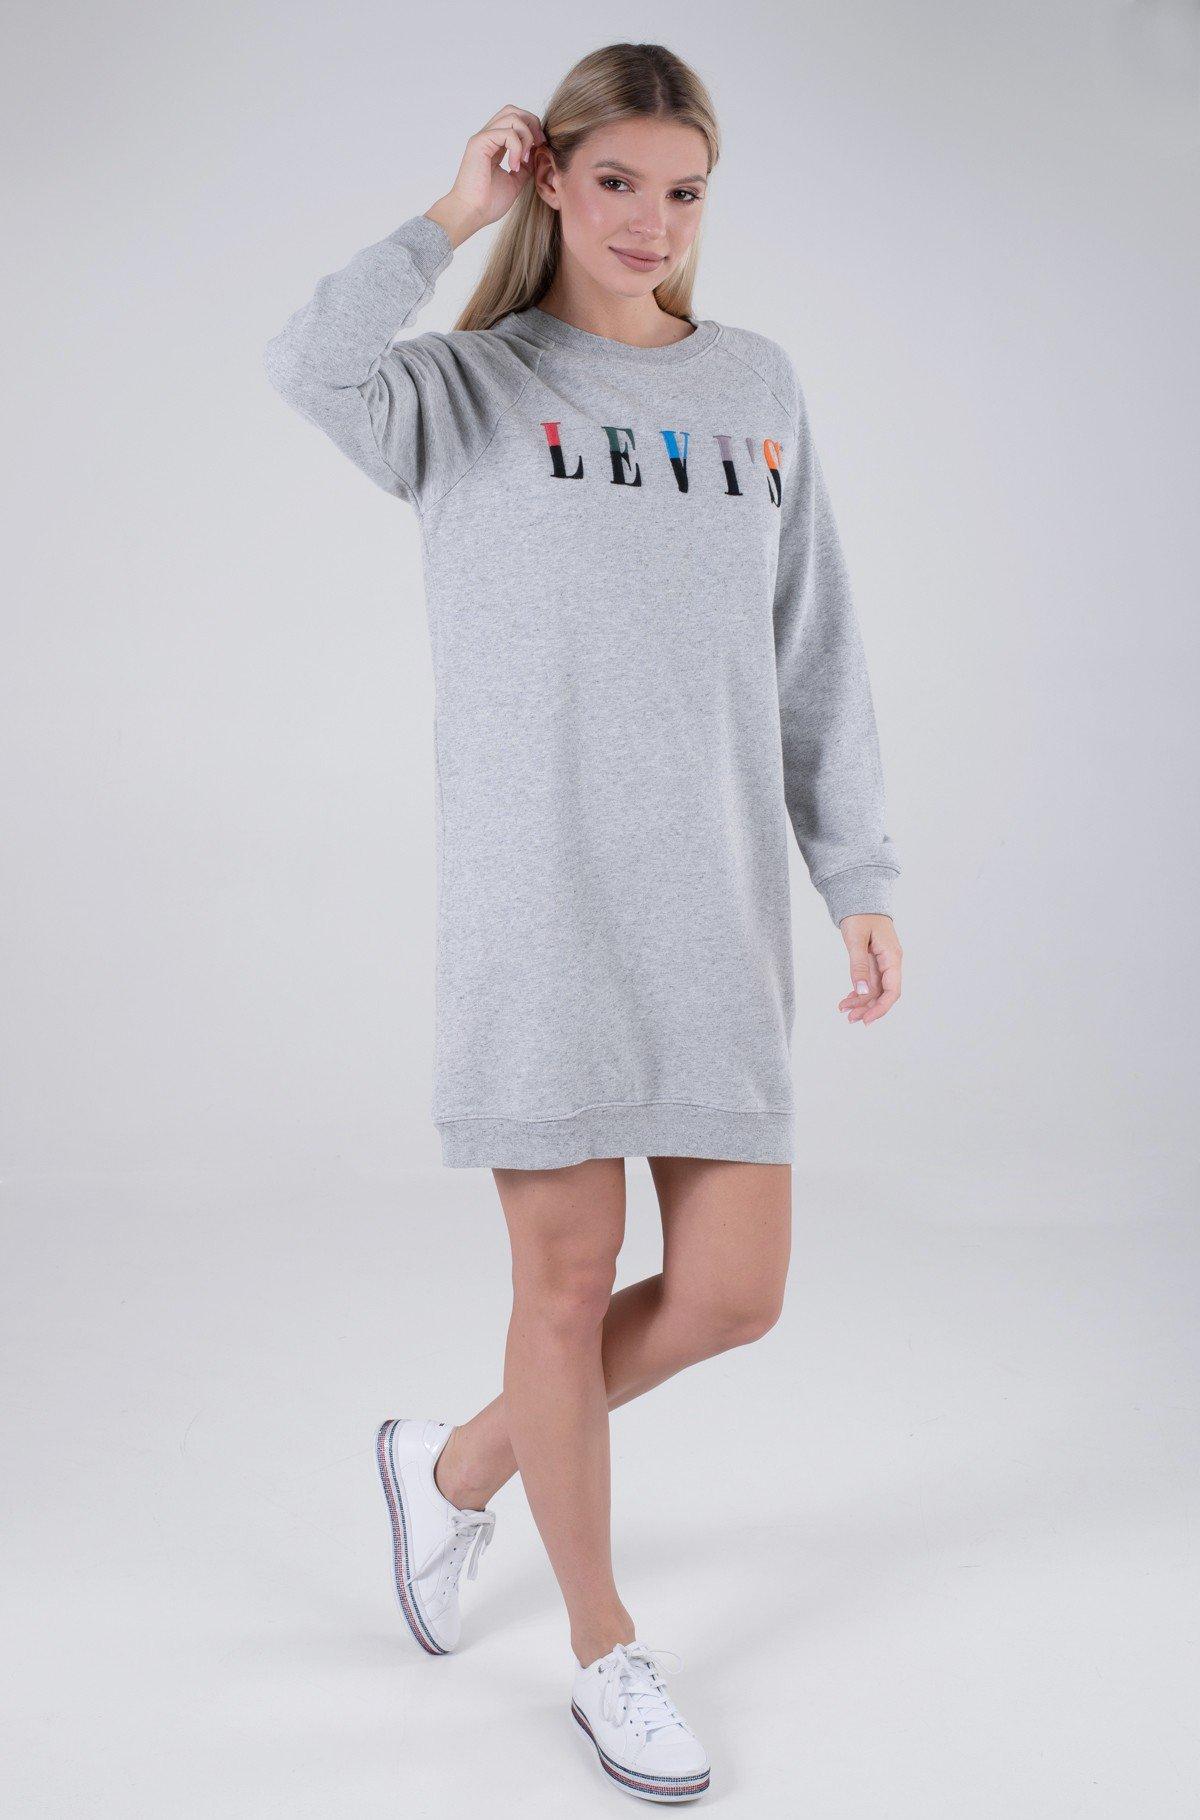 Sweatshirt dress 818600006-full-1